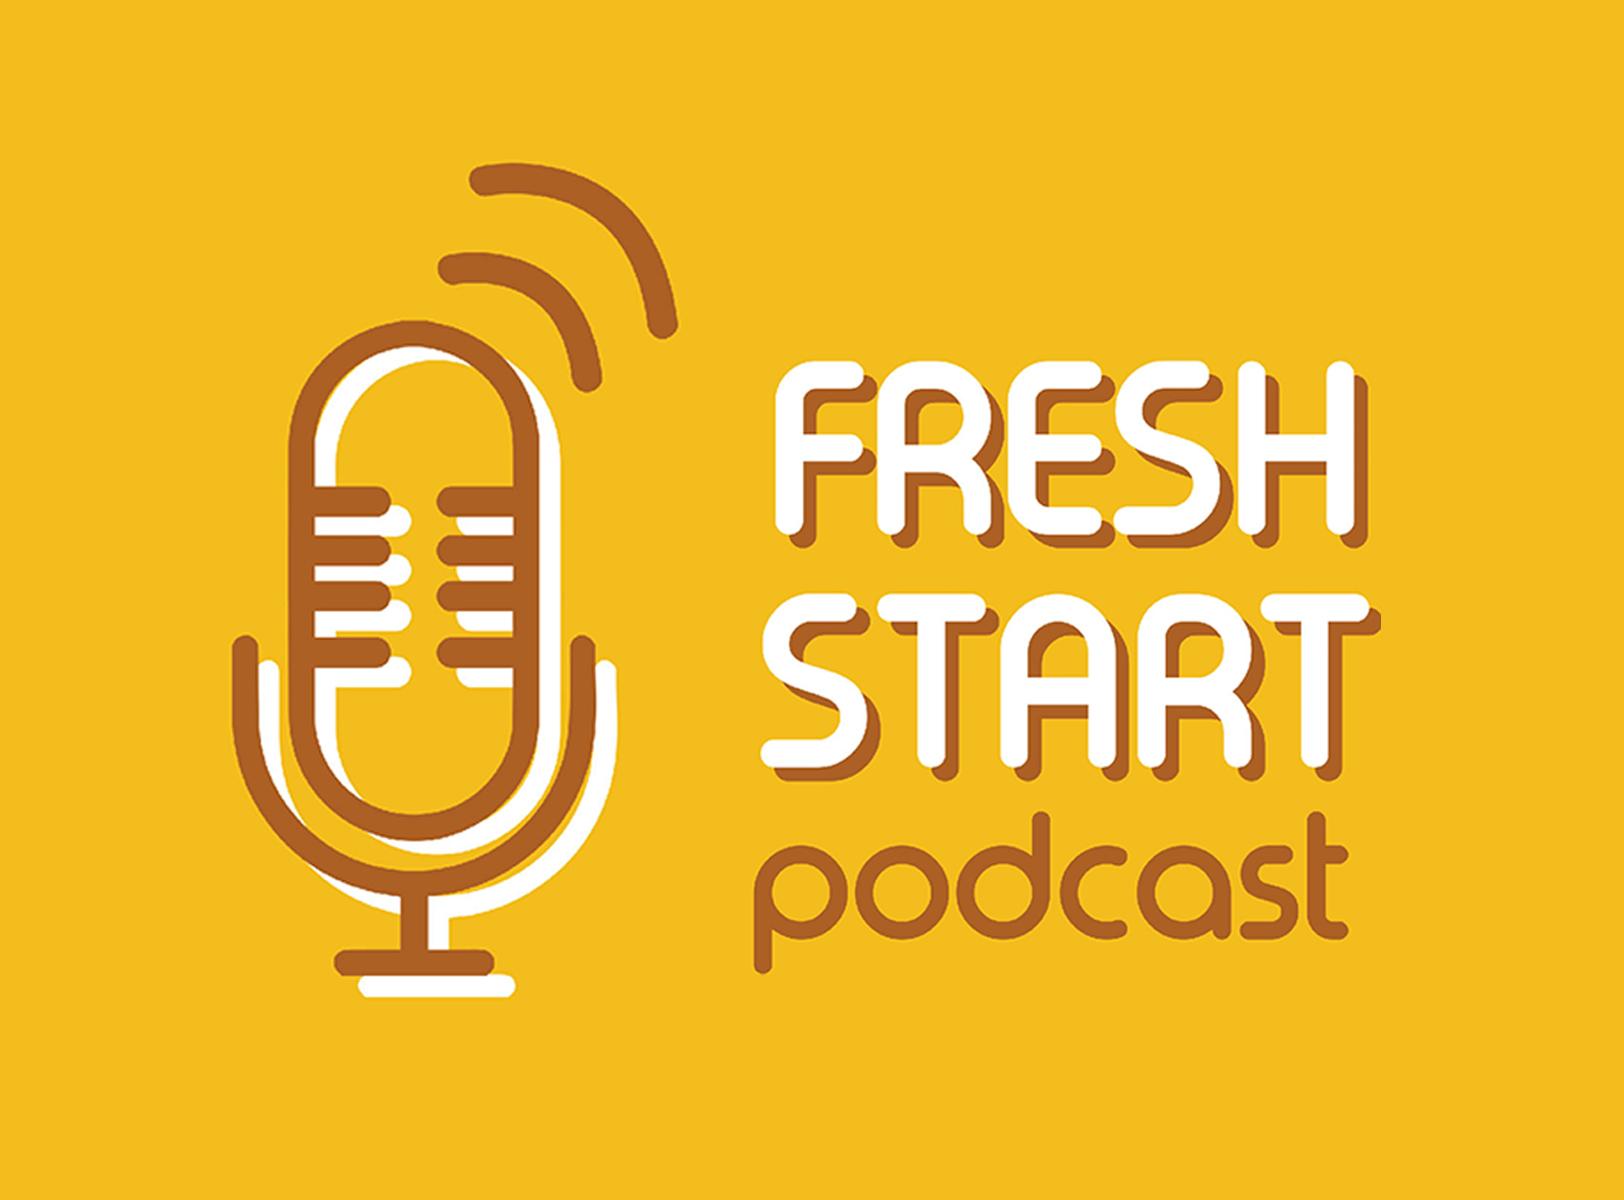 Fresh Start: Podcast News (10/29/2019 Tue.)